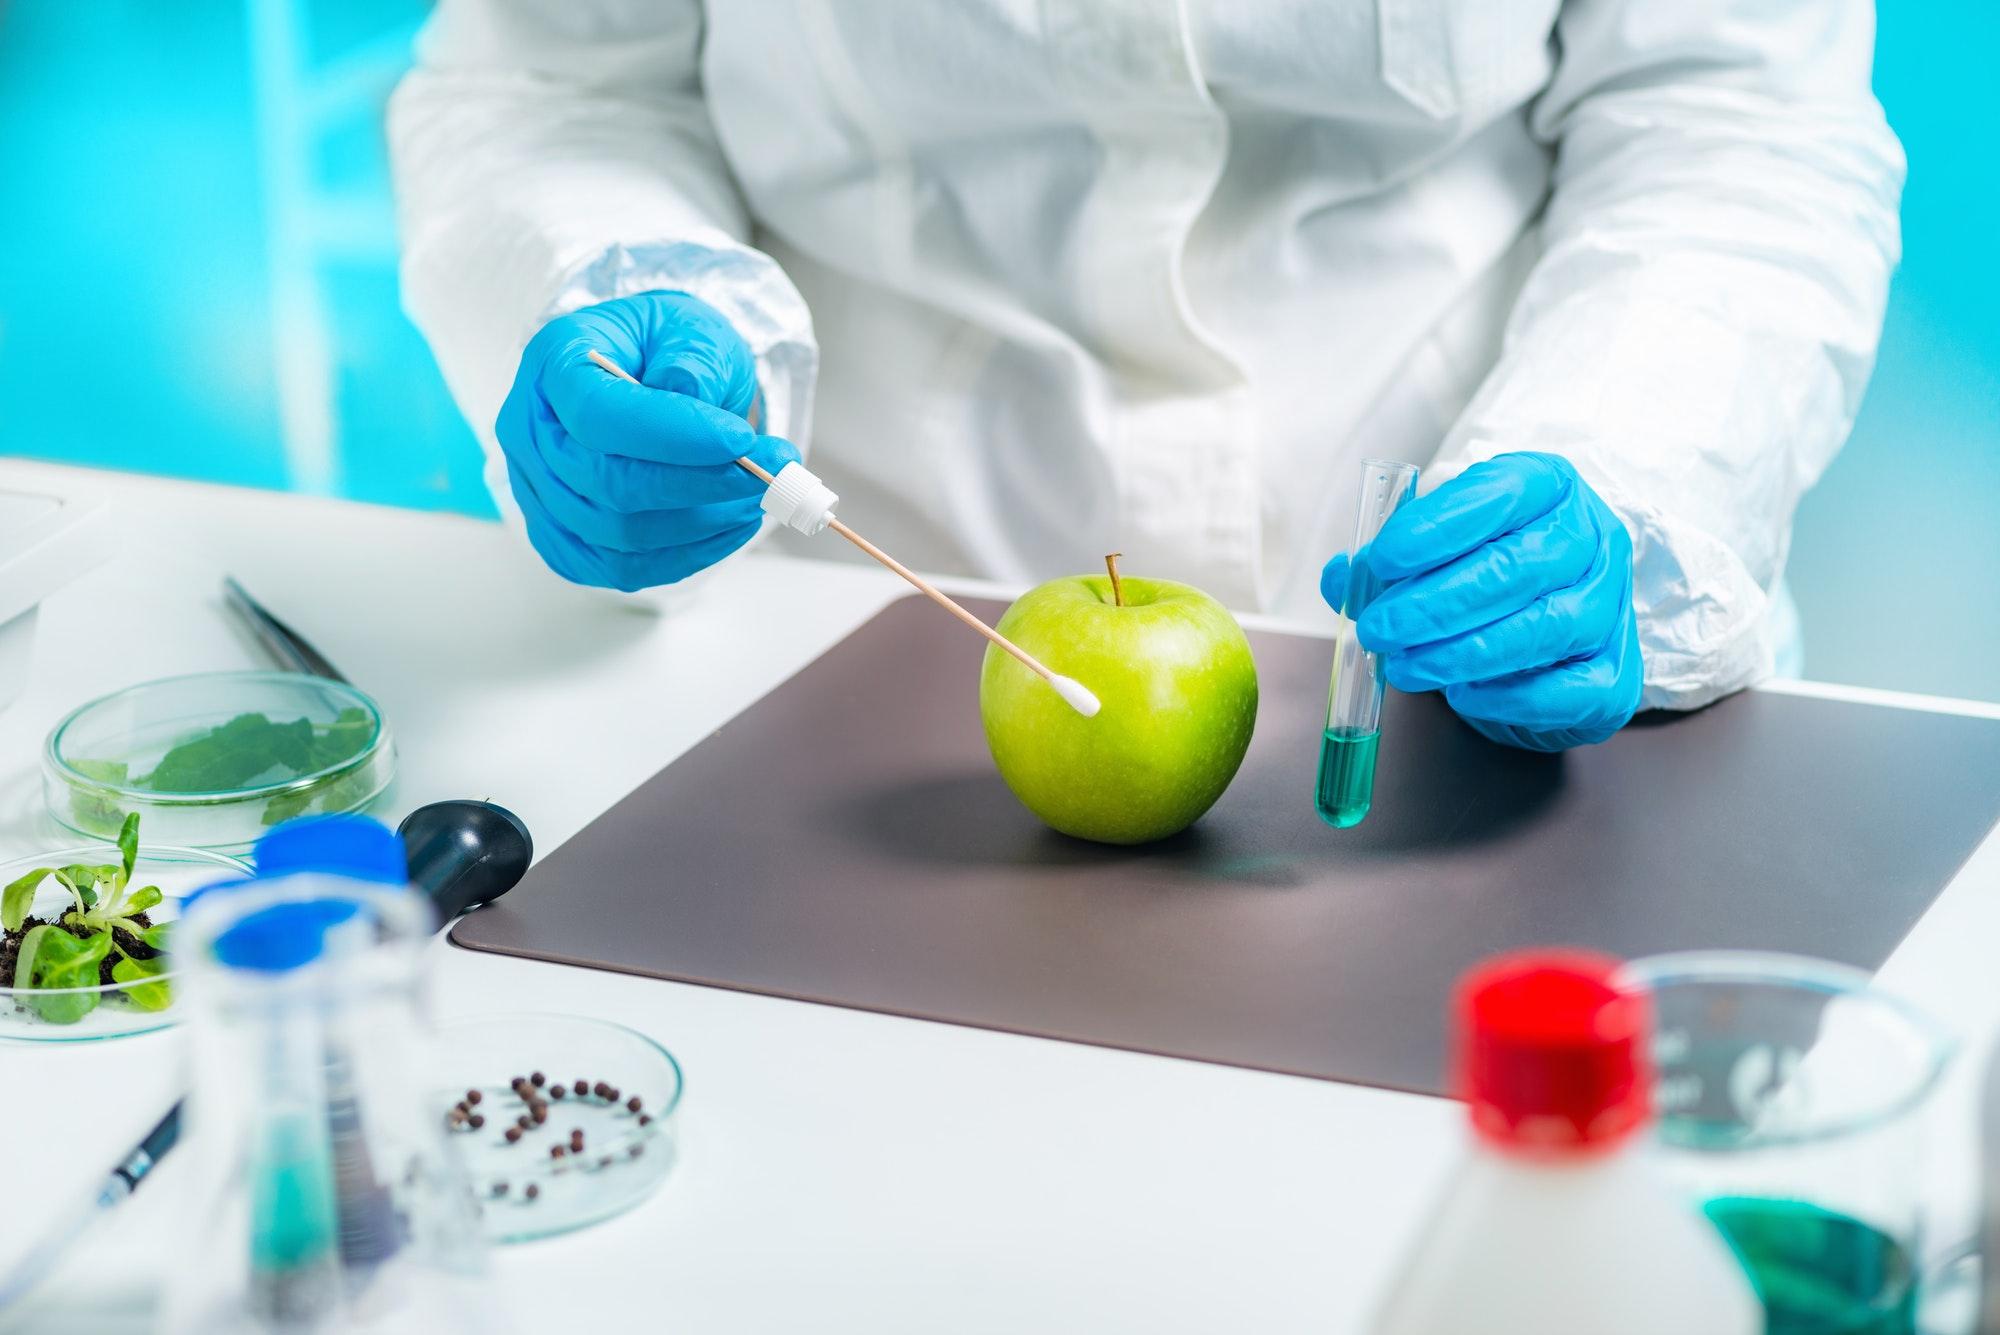 Biologist examining apple for pesticides